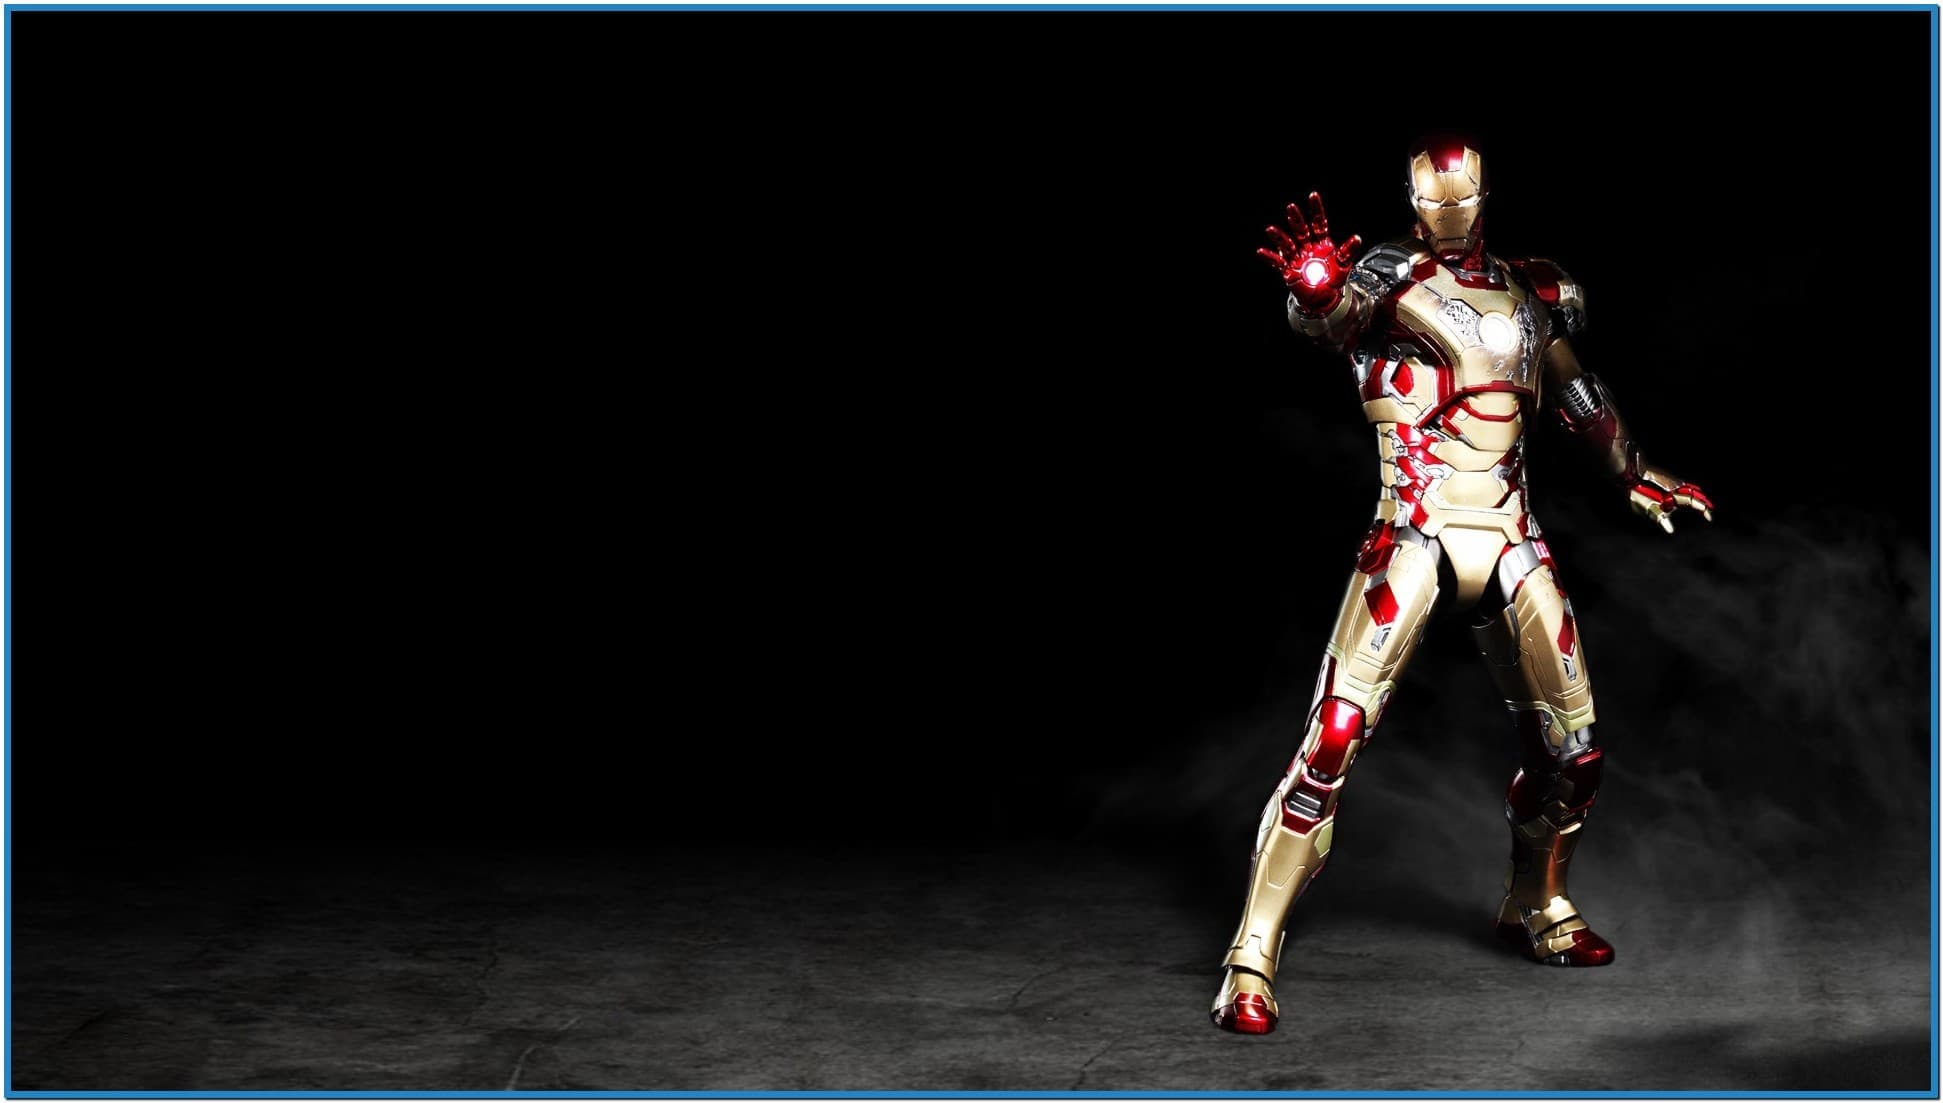 Screensaver iron man 3   Download 1943x1103